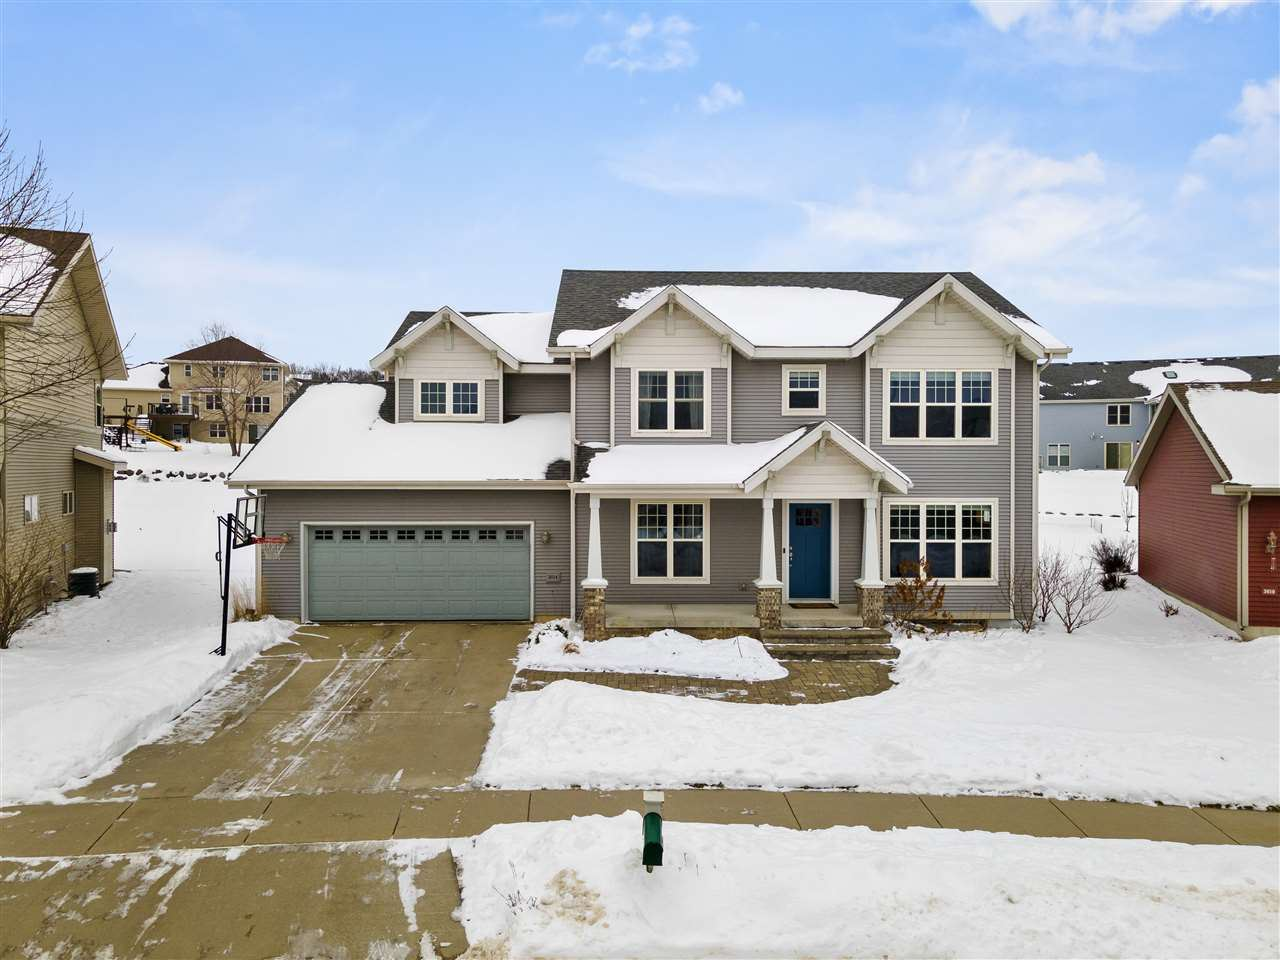 3014 Winter Park Pl, Madison, WI 53719 - #: 1900447